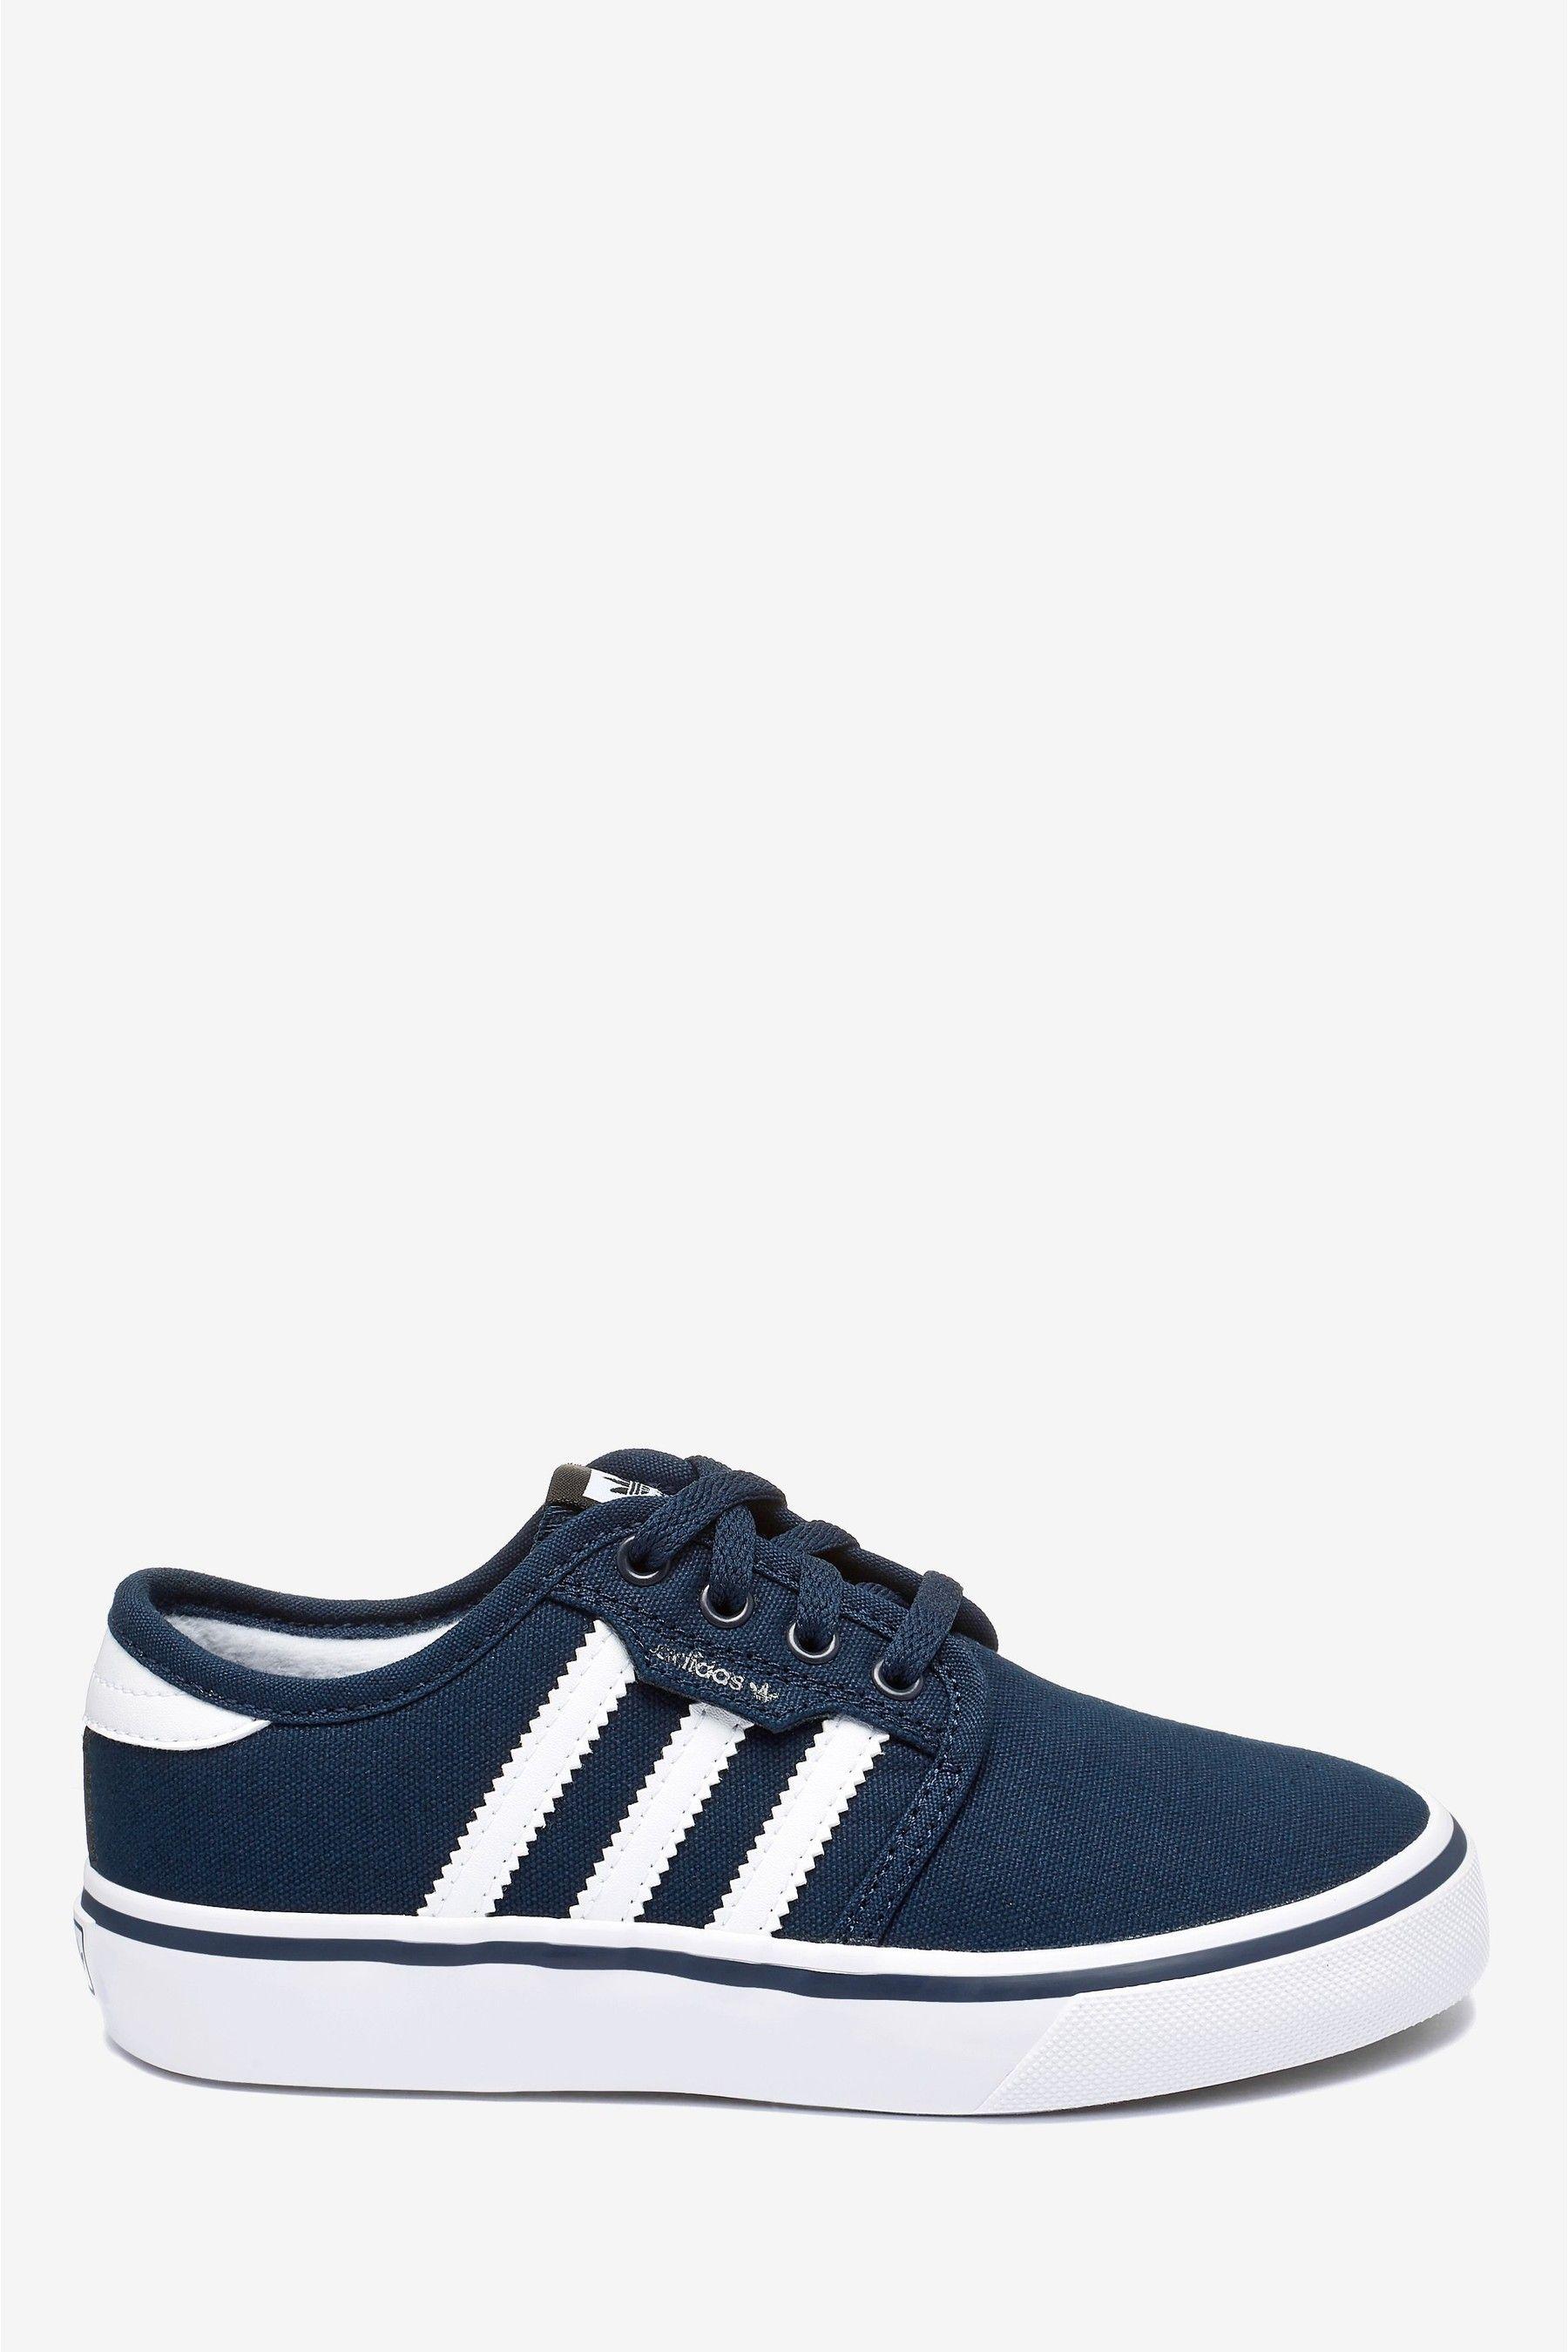 Boys adidas Originals Navy Seeley